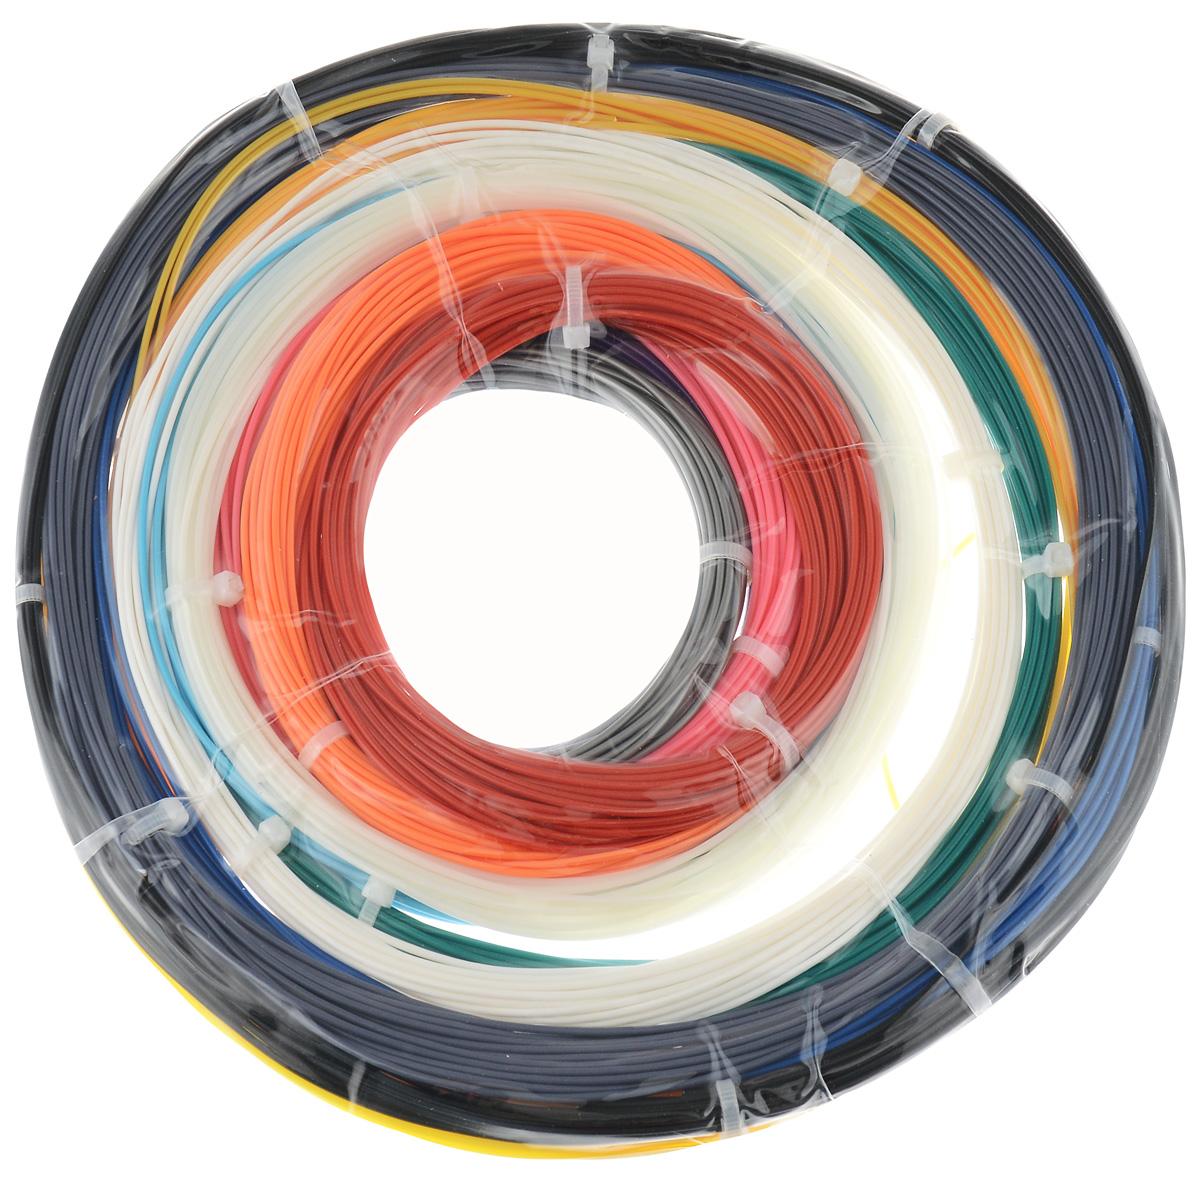 ESUN комплект ABS-пластика, 14 цветов, 9 мABS175 Kits 3D PensКомплект ABS-пластика для 3D печати ESUN, состоящий из 14 цветов. Толщина пластика составляет 1,75 мм. Длина каждого мотка - 9 метров.